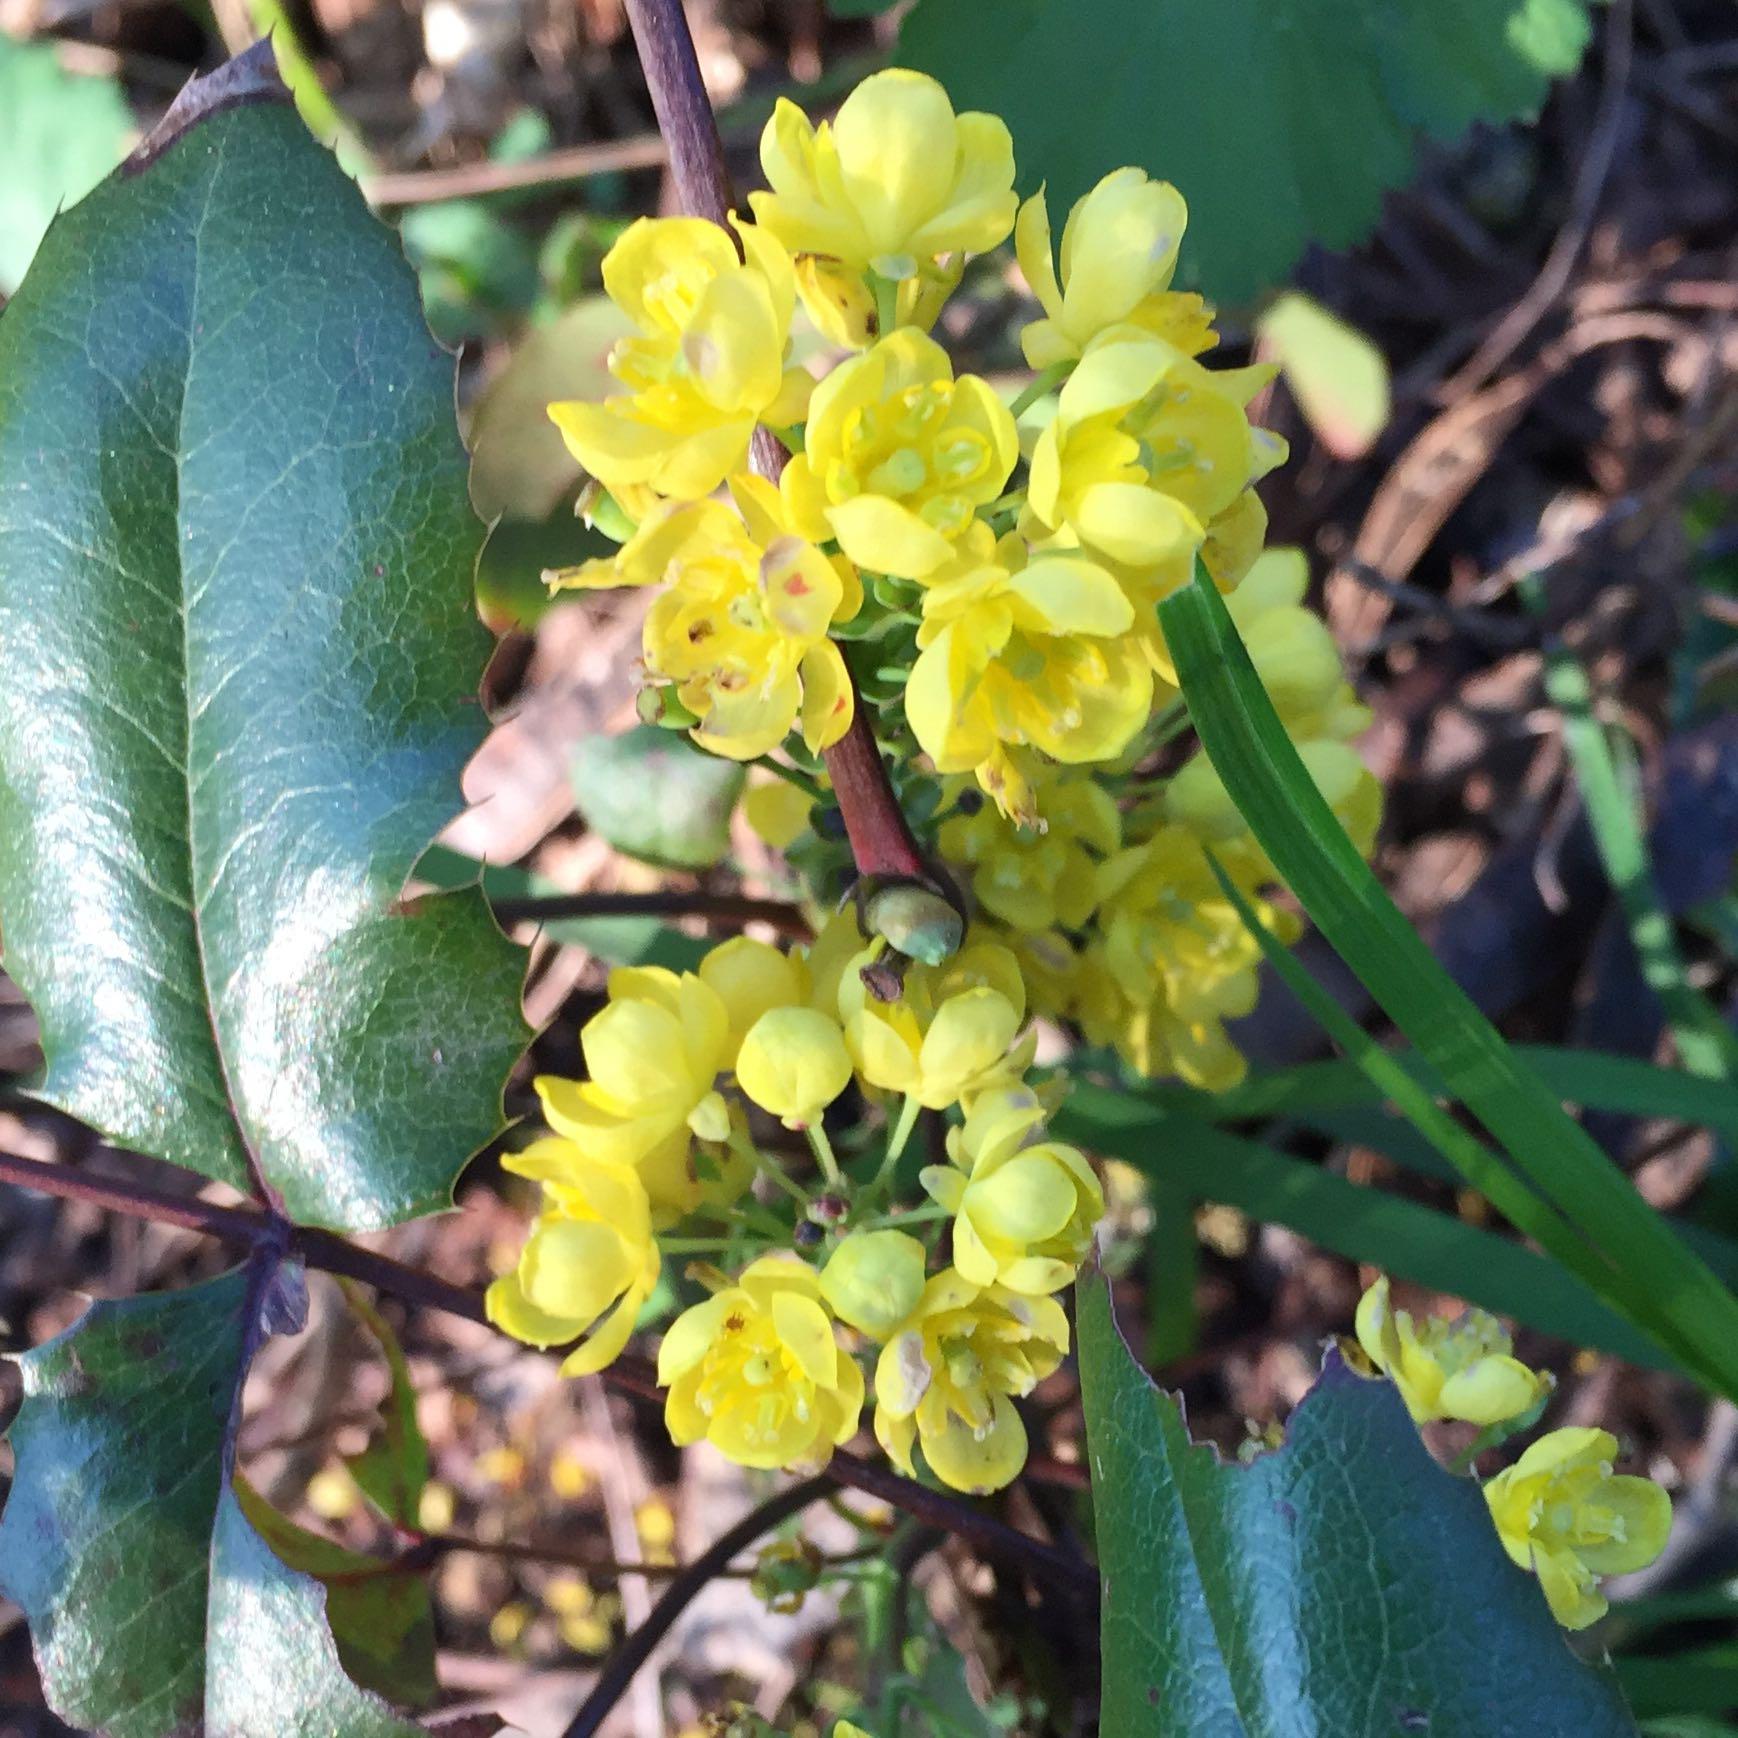 kennt jemand diese pflanze gelbe bl te stachelige bl tter. Black Bedroom Furniture Sets. Home Design Ideas